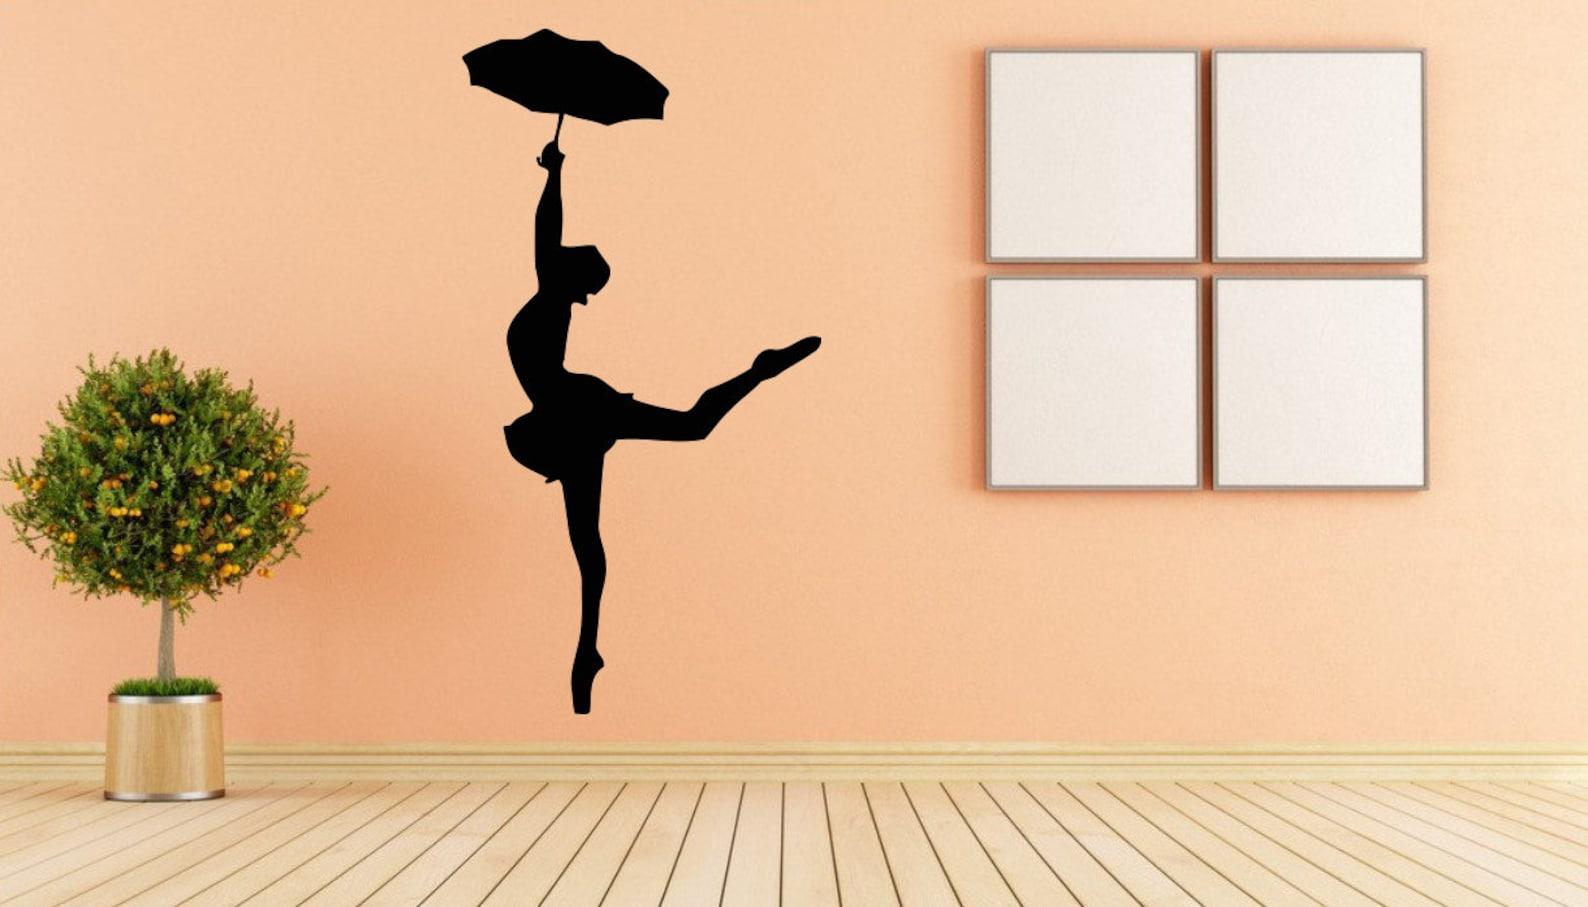 ballet, dance, ballet tutu, pointe shoes, ballet school wall decal window sticker handmade 1556